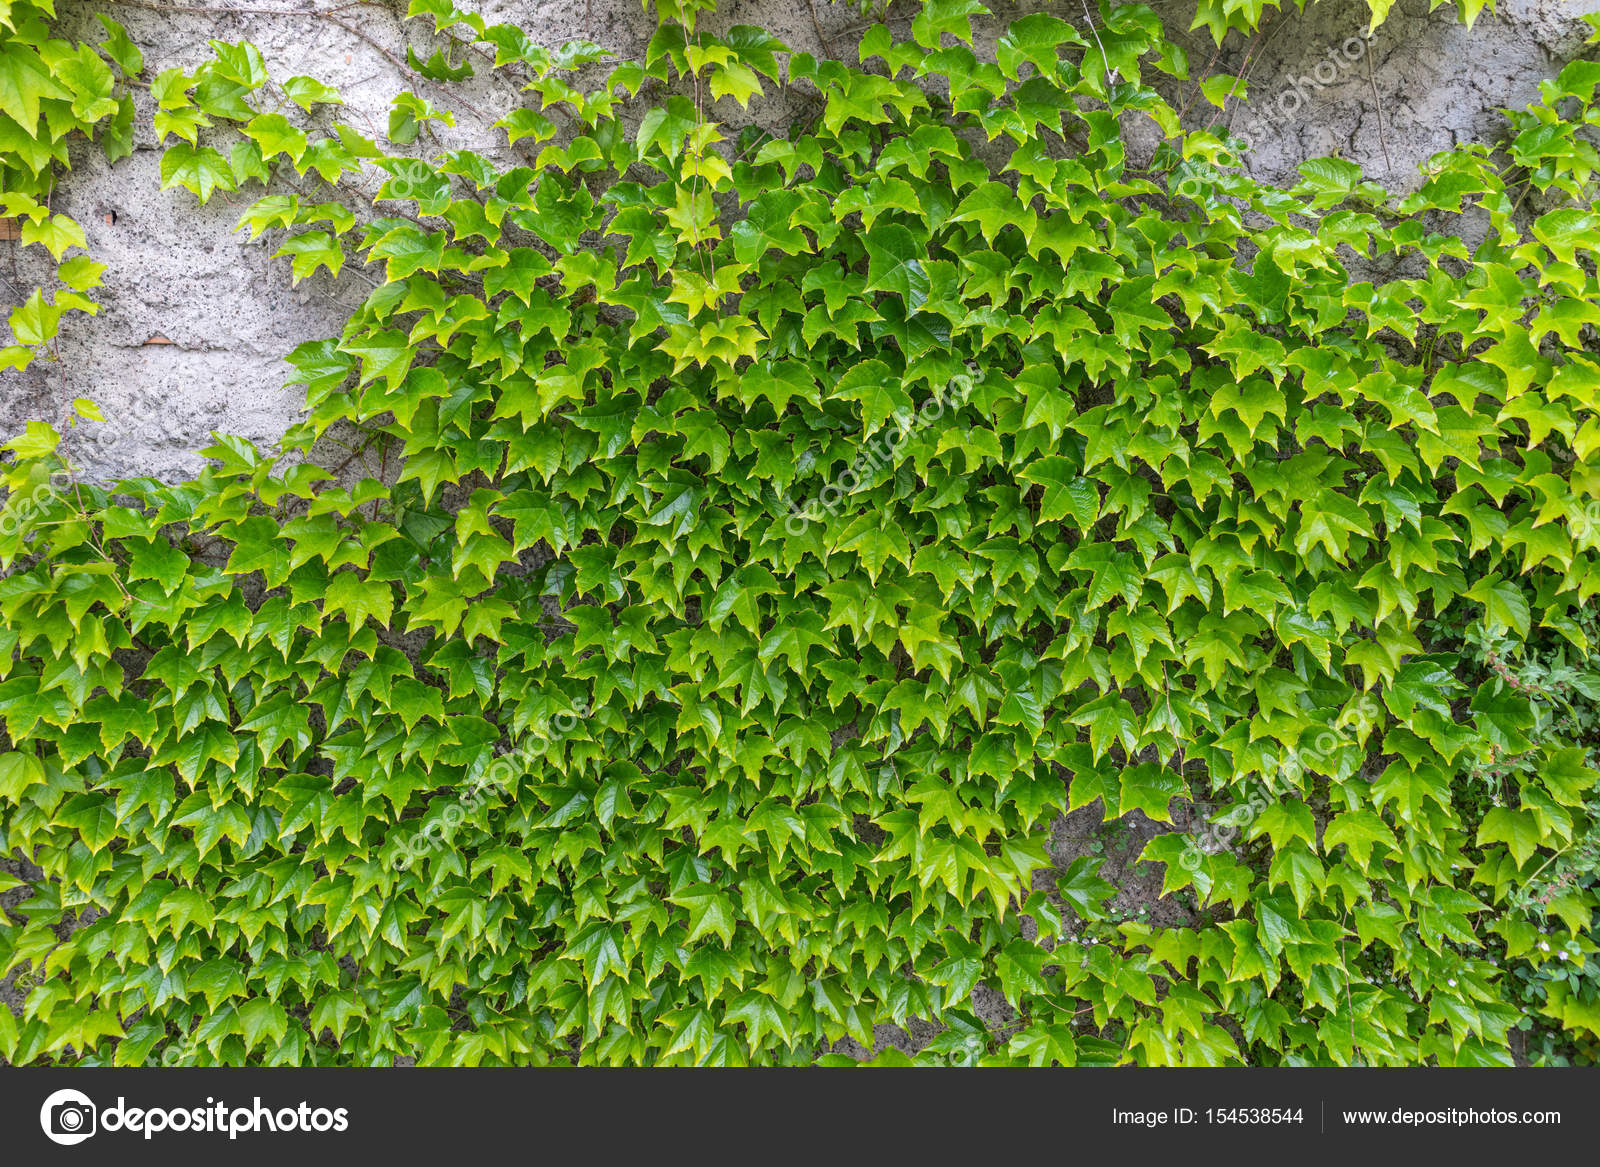 Muro de plantas plantas trepadoras para decorar muros for Plantas trepadoras para muros